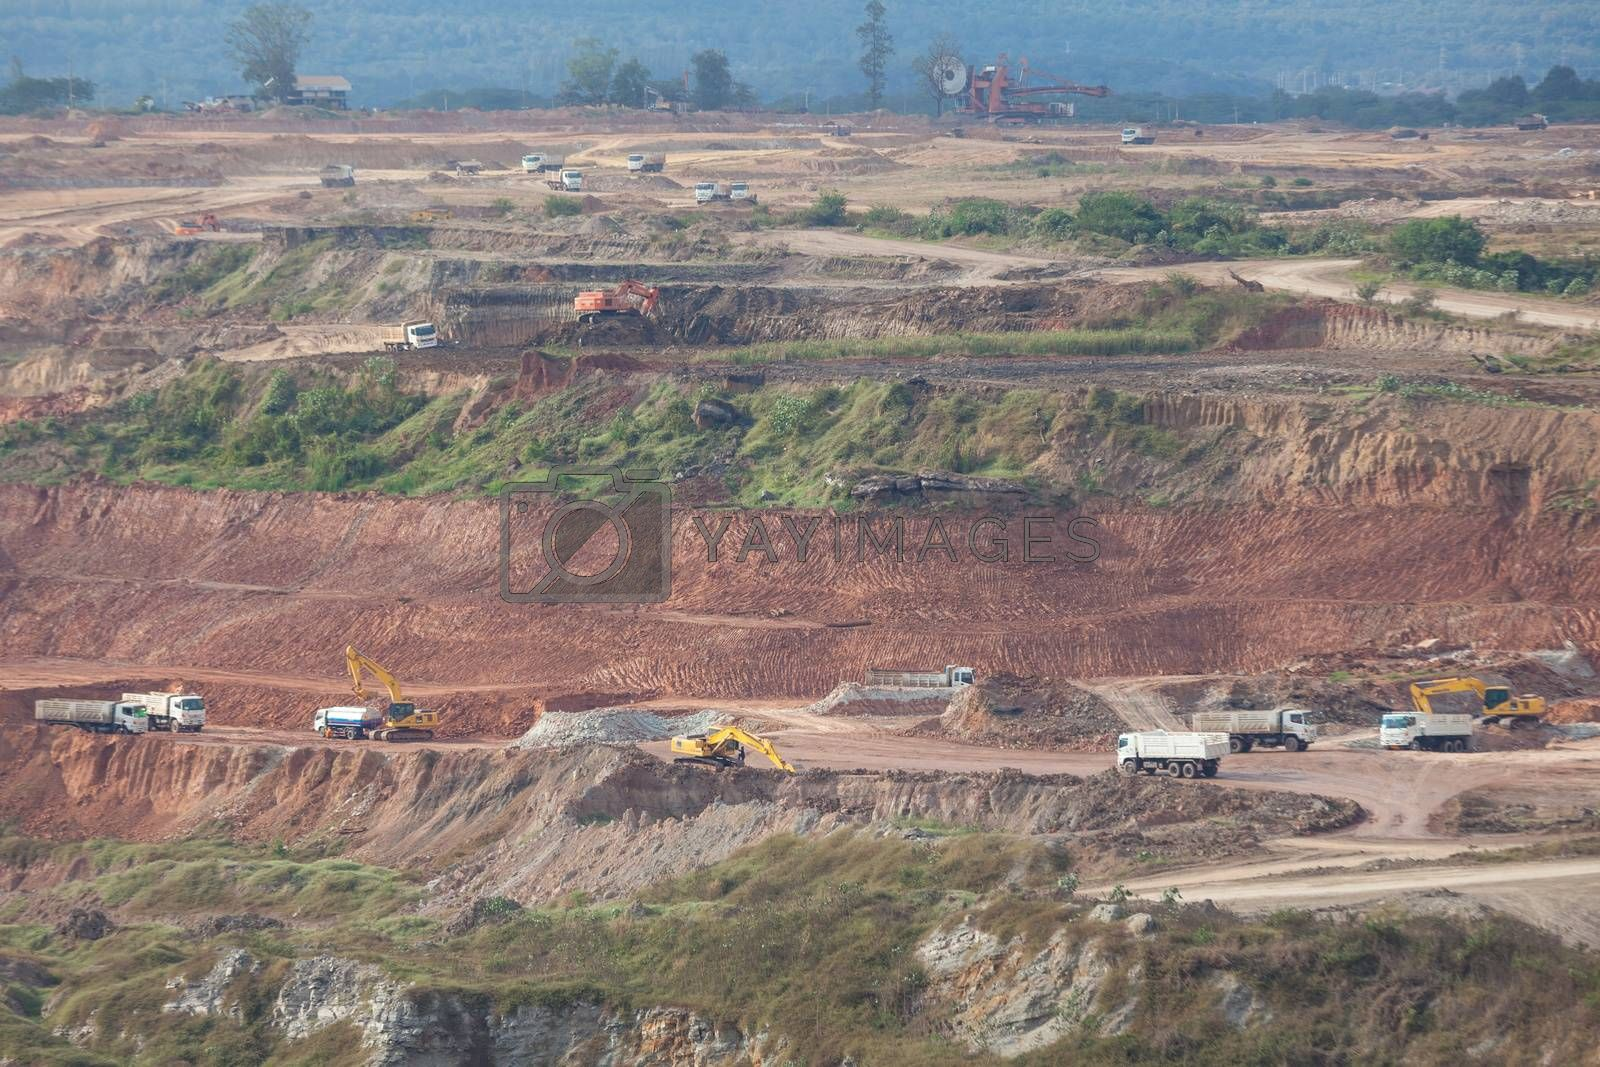 Loading of iron ore on very big dump body truck in lignite mine